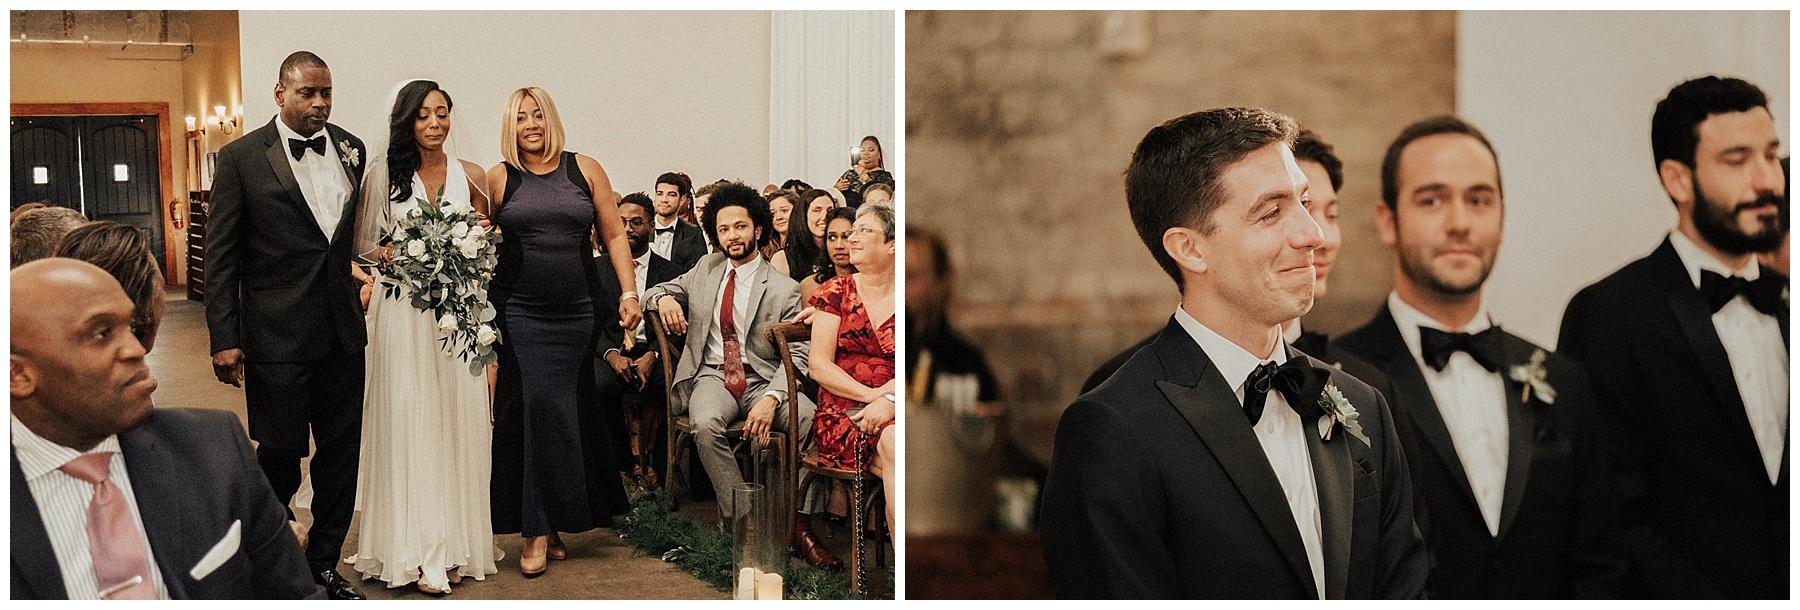 Rialto Theatre Tampa Wedding Photographer-81.jpg